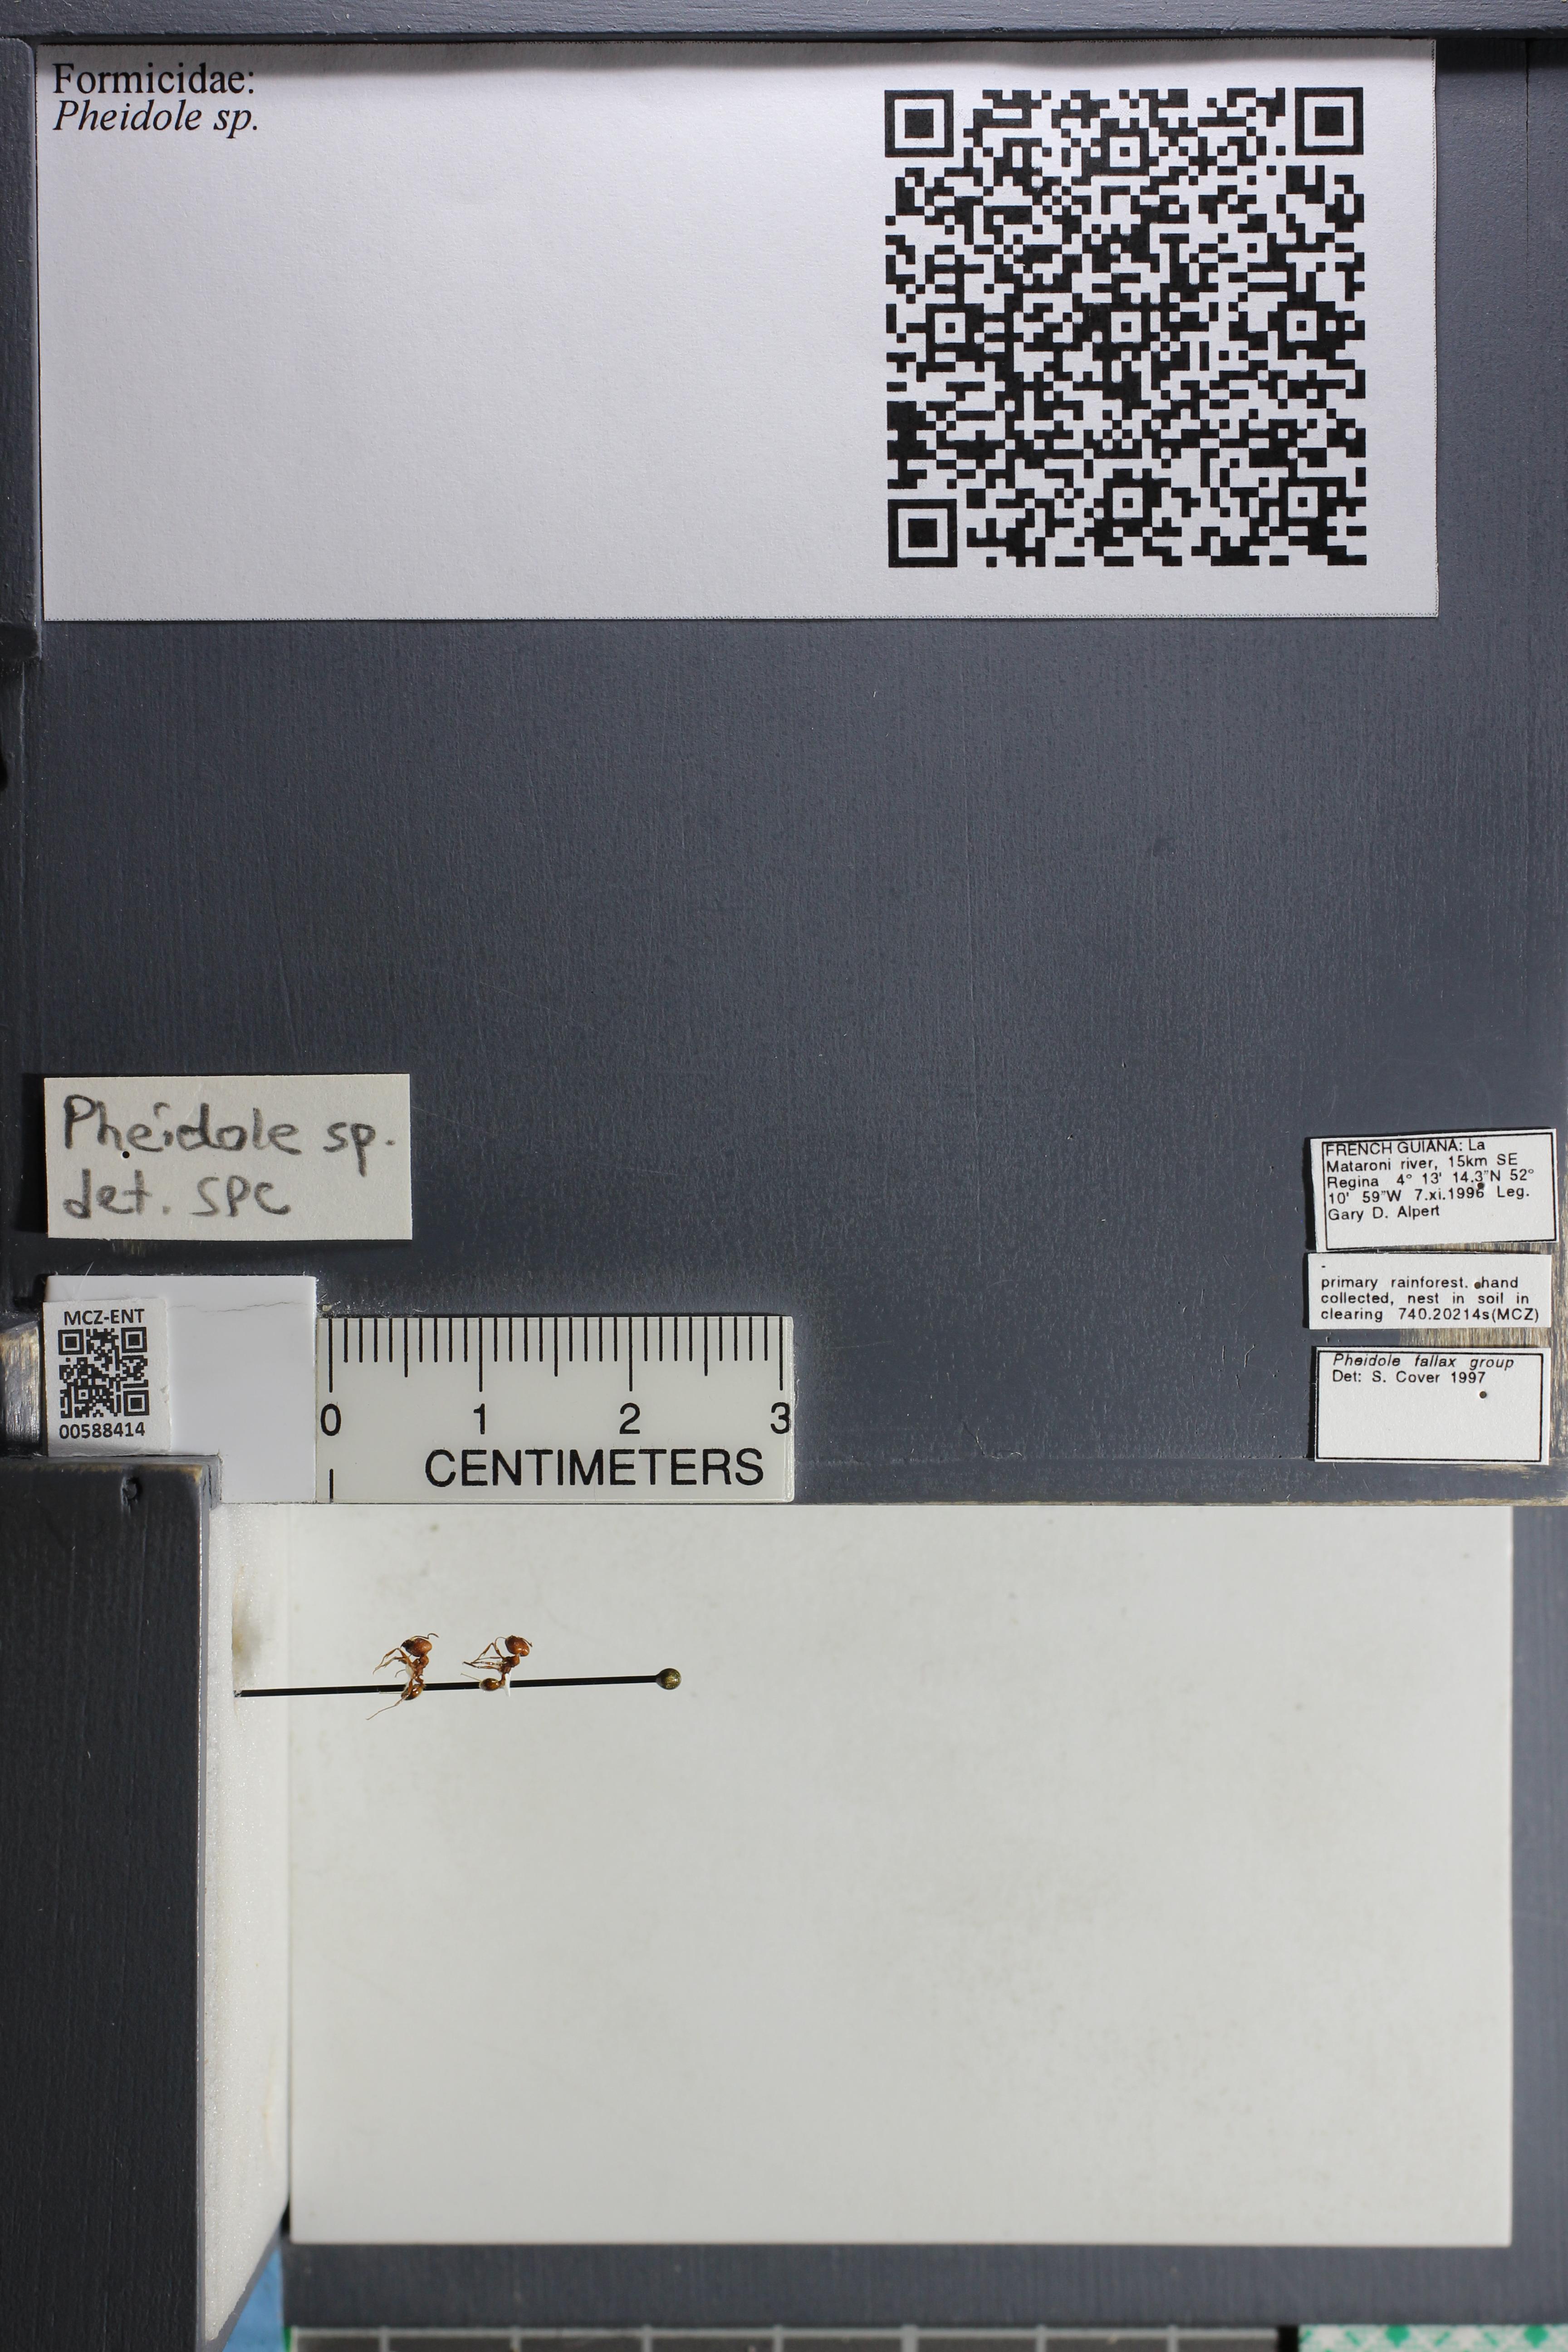 Media of type image, MCZ:Ent:588414 Identified as Pheidole sp..